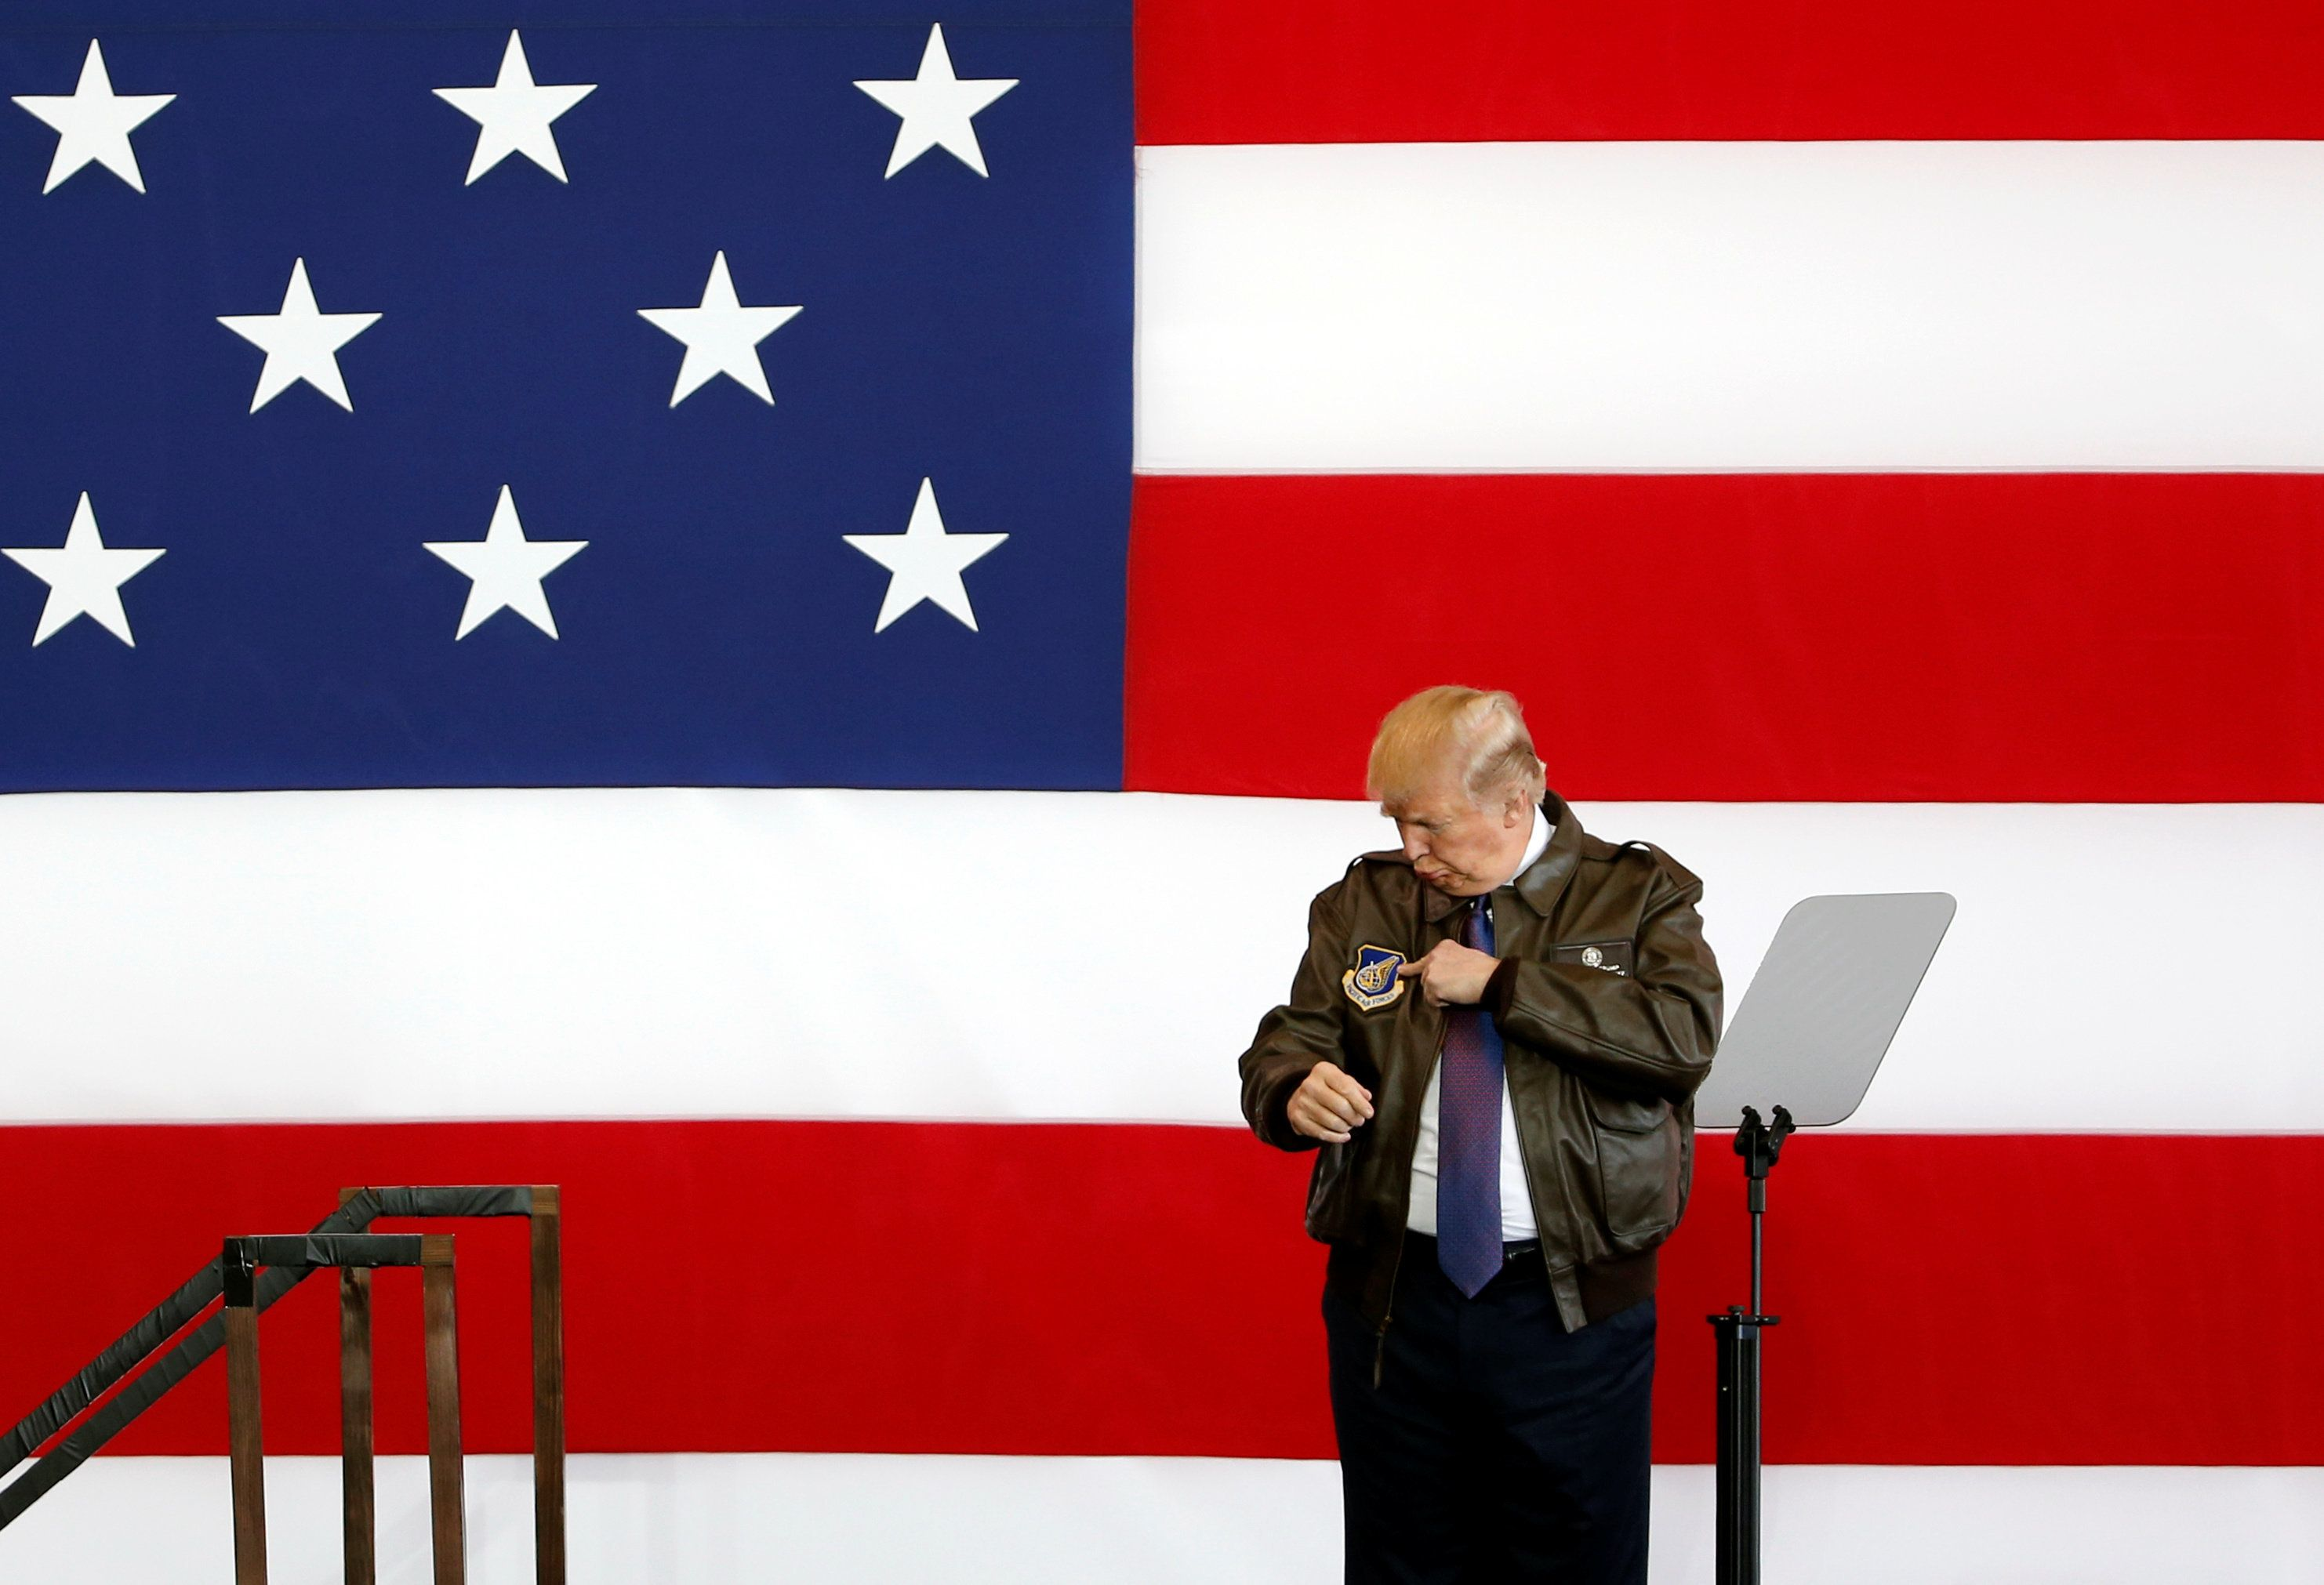 Senator Demands Secret Trump Memo On Power To Wage War Be